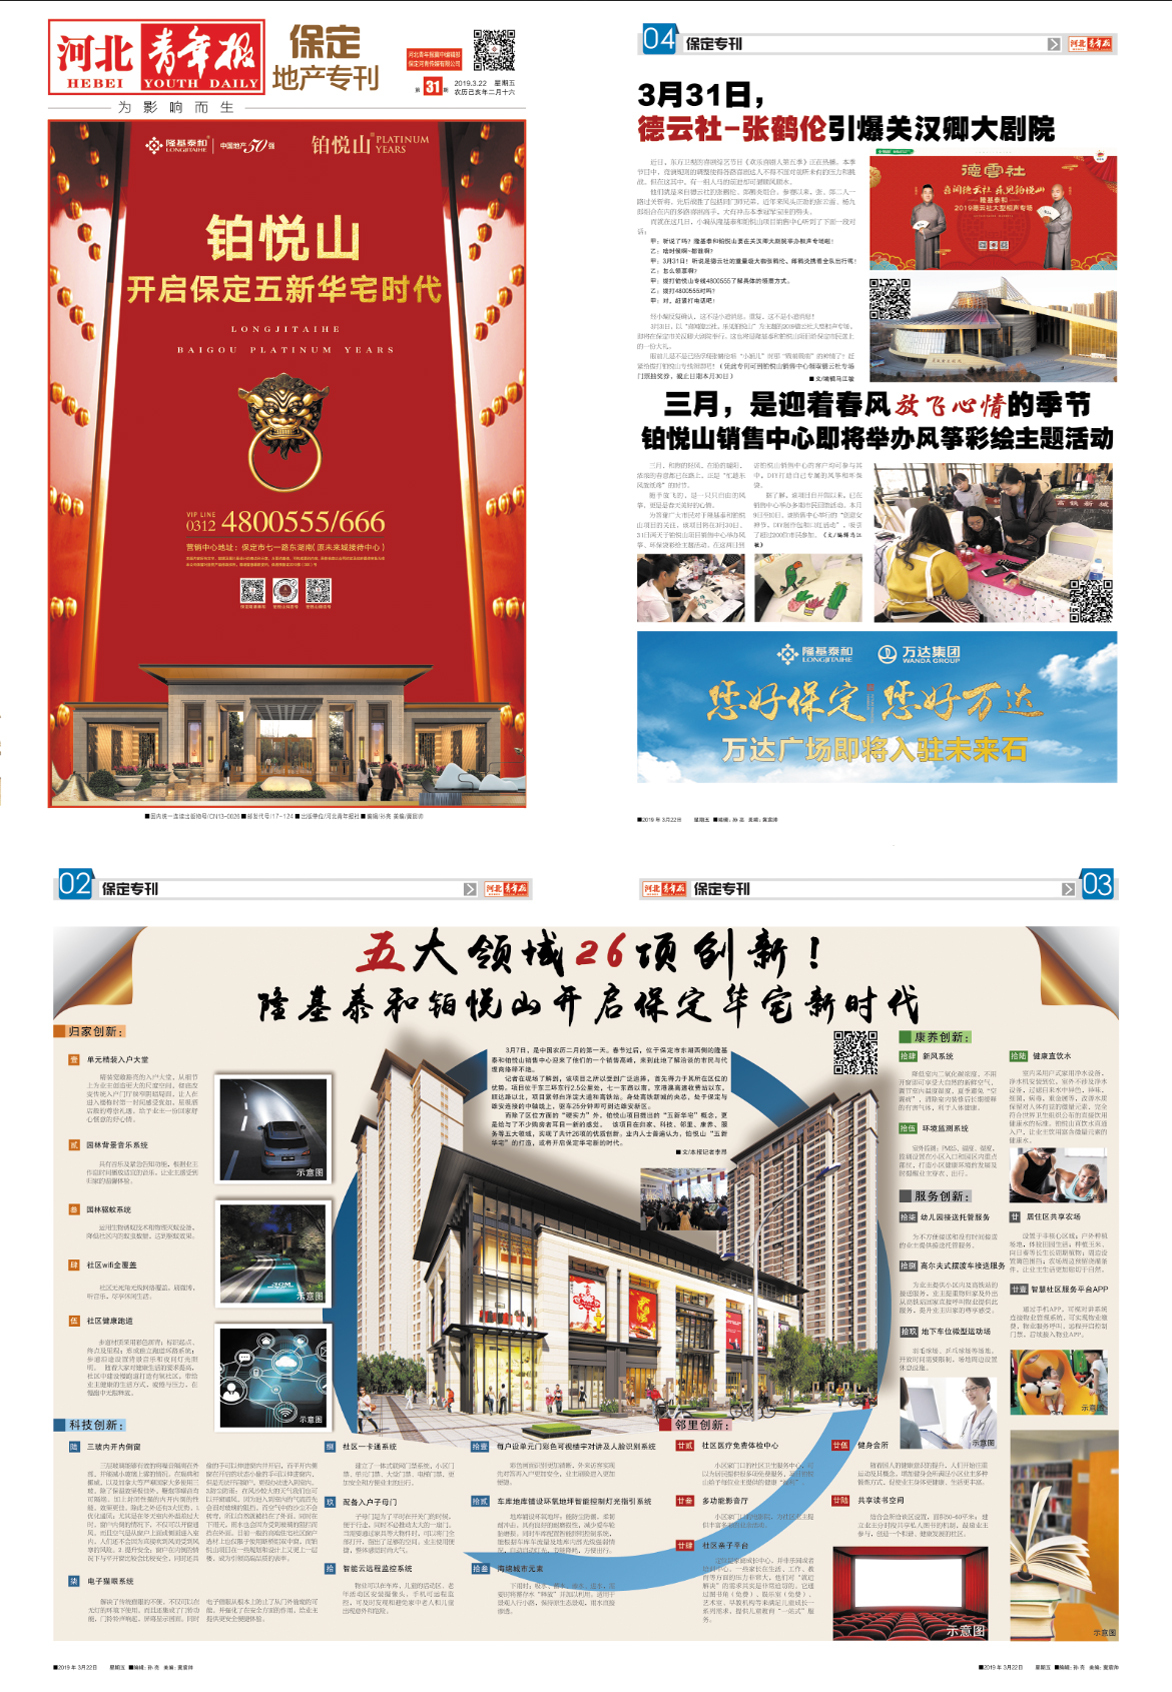 http://www.bdxyx.com/wenhuayichan/29368.html